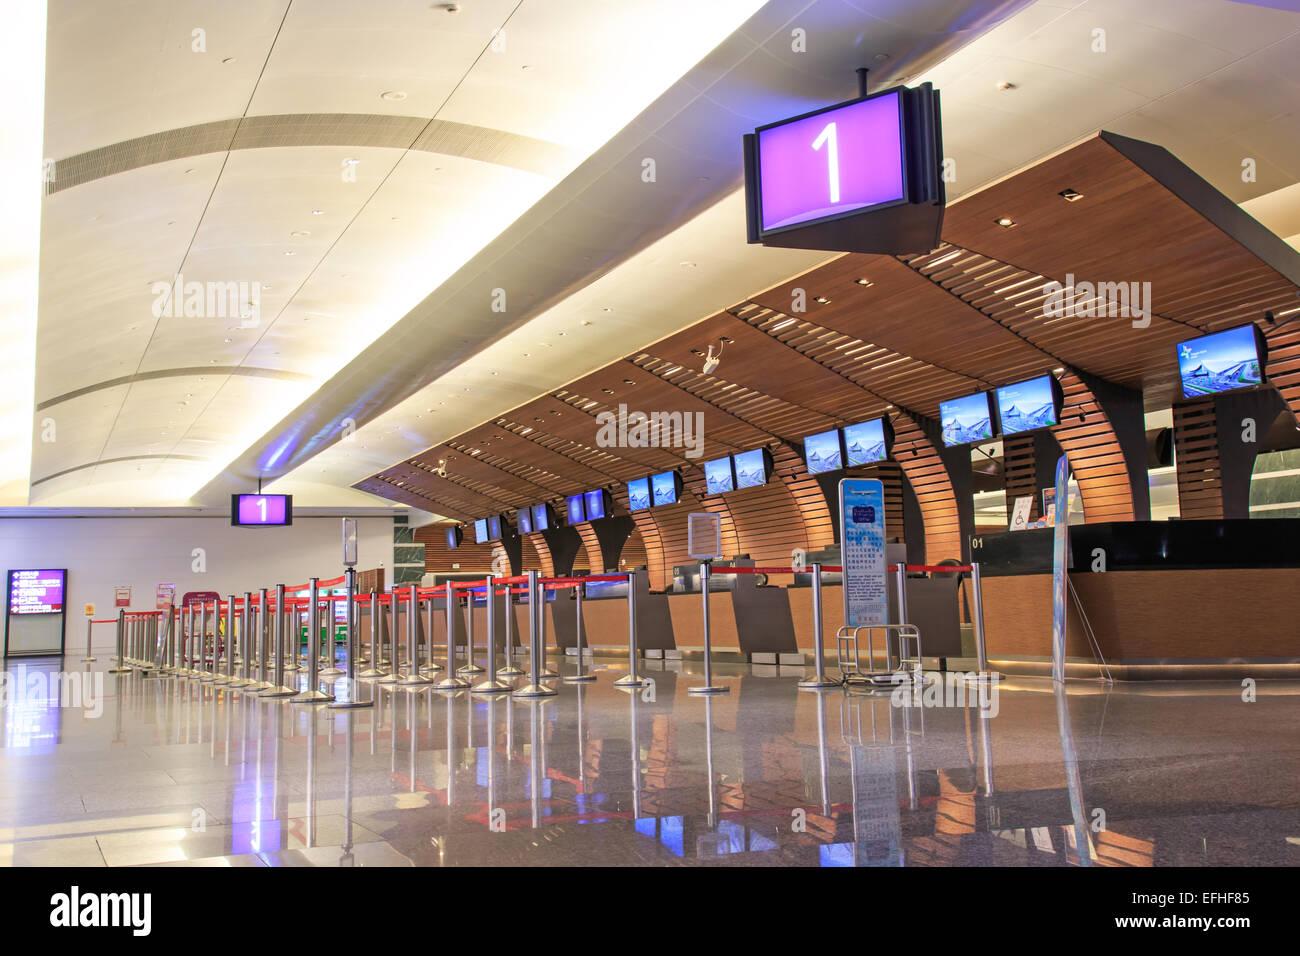 Taipei, Taiwan - January 9, 2015: Counters inside the Taiwan Taoyuan International Airport, the busiest airport - Stock Image